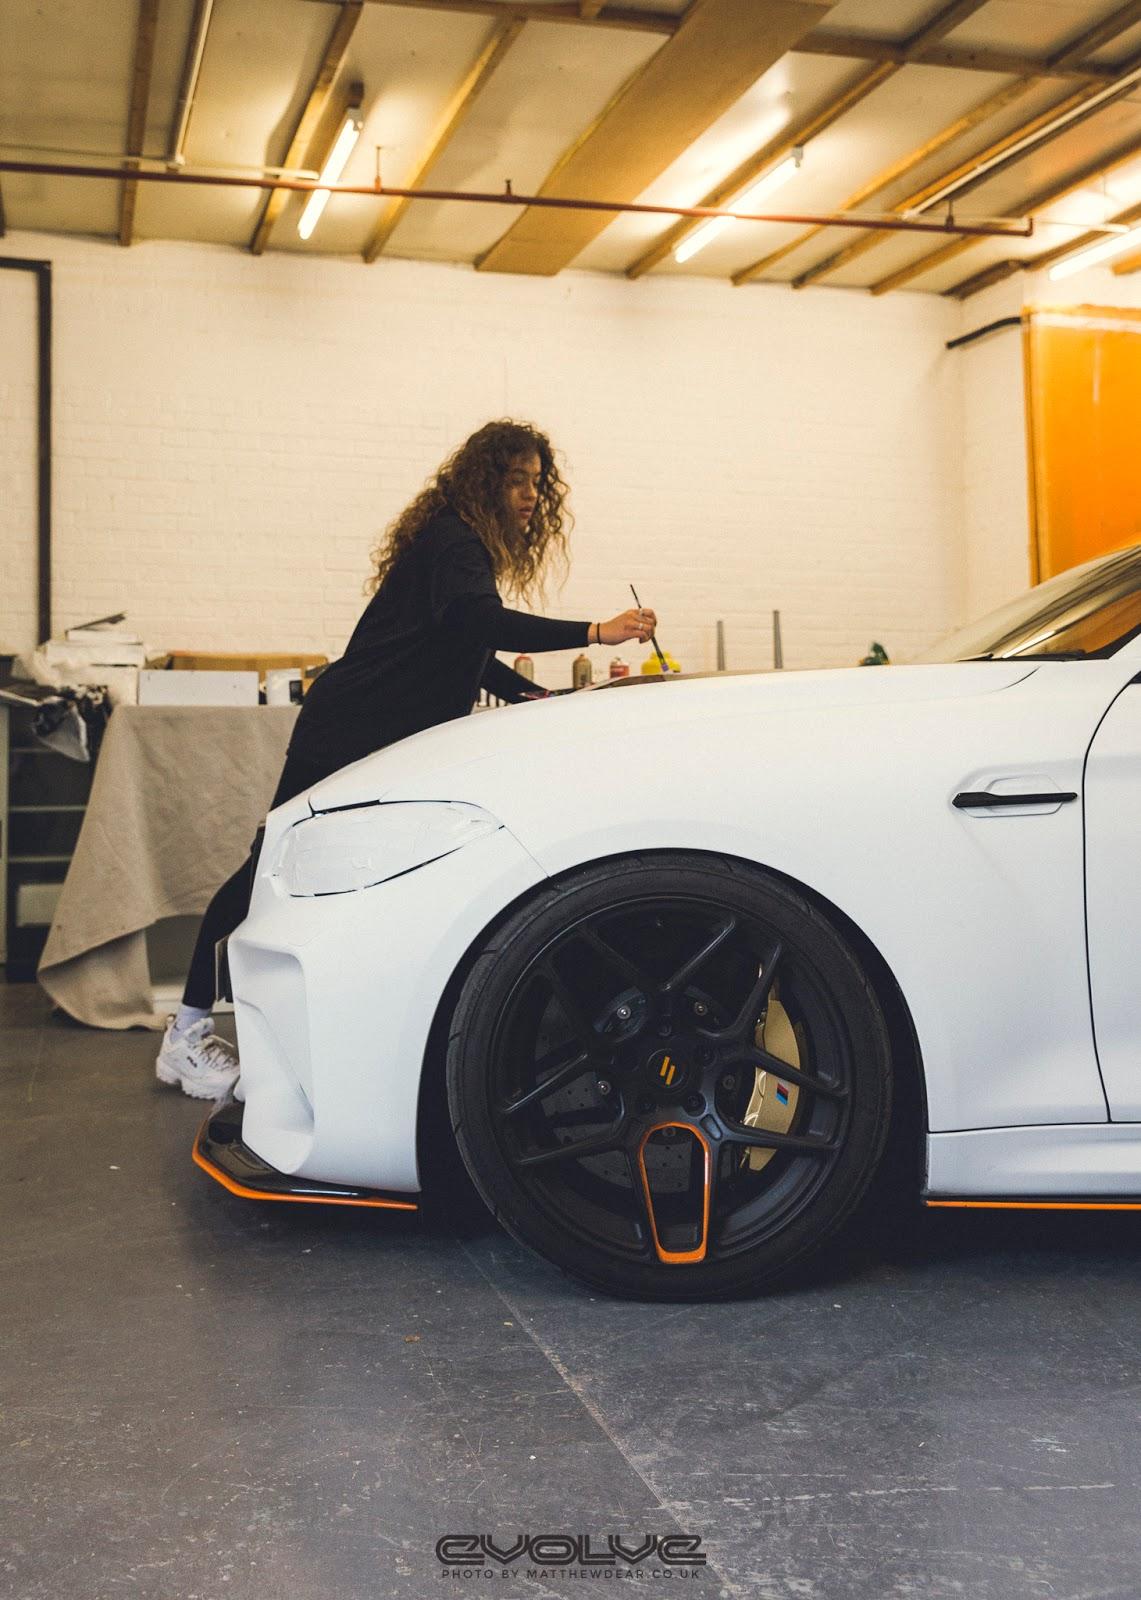 evolve-automotive-bmw-m2-gts-art-car-5